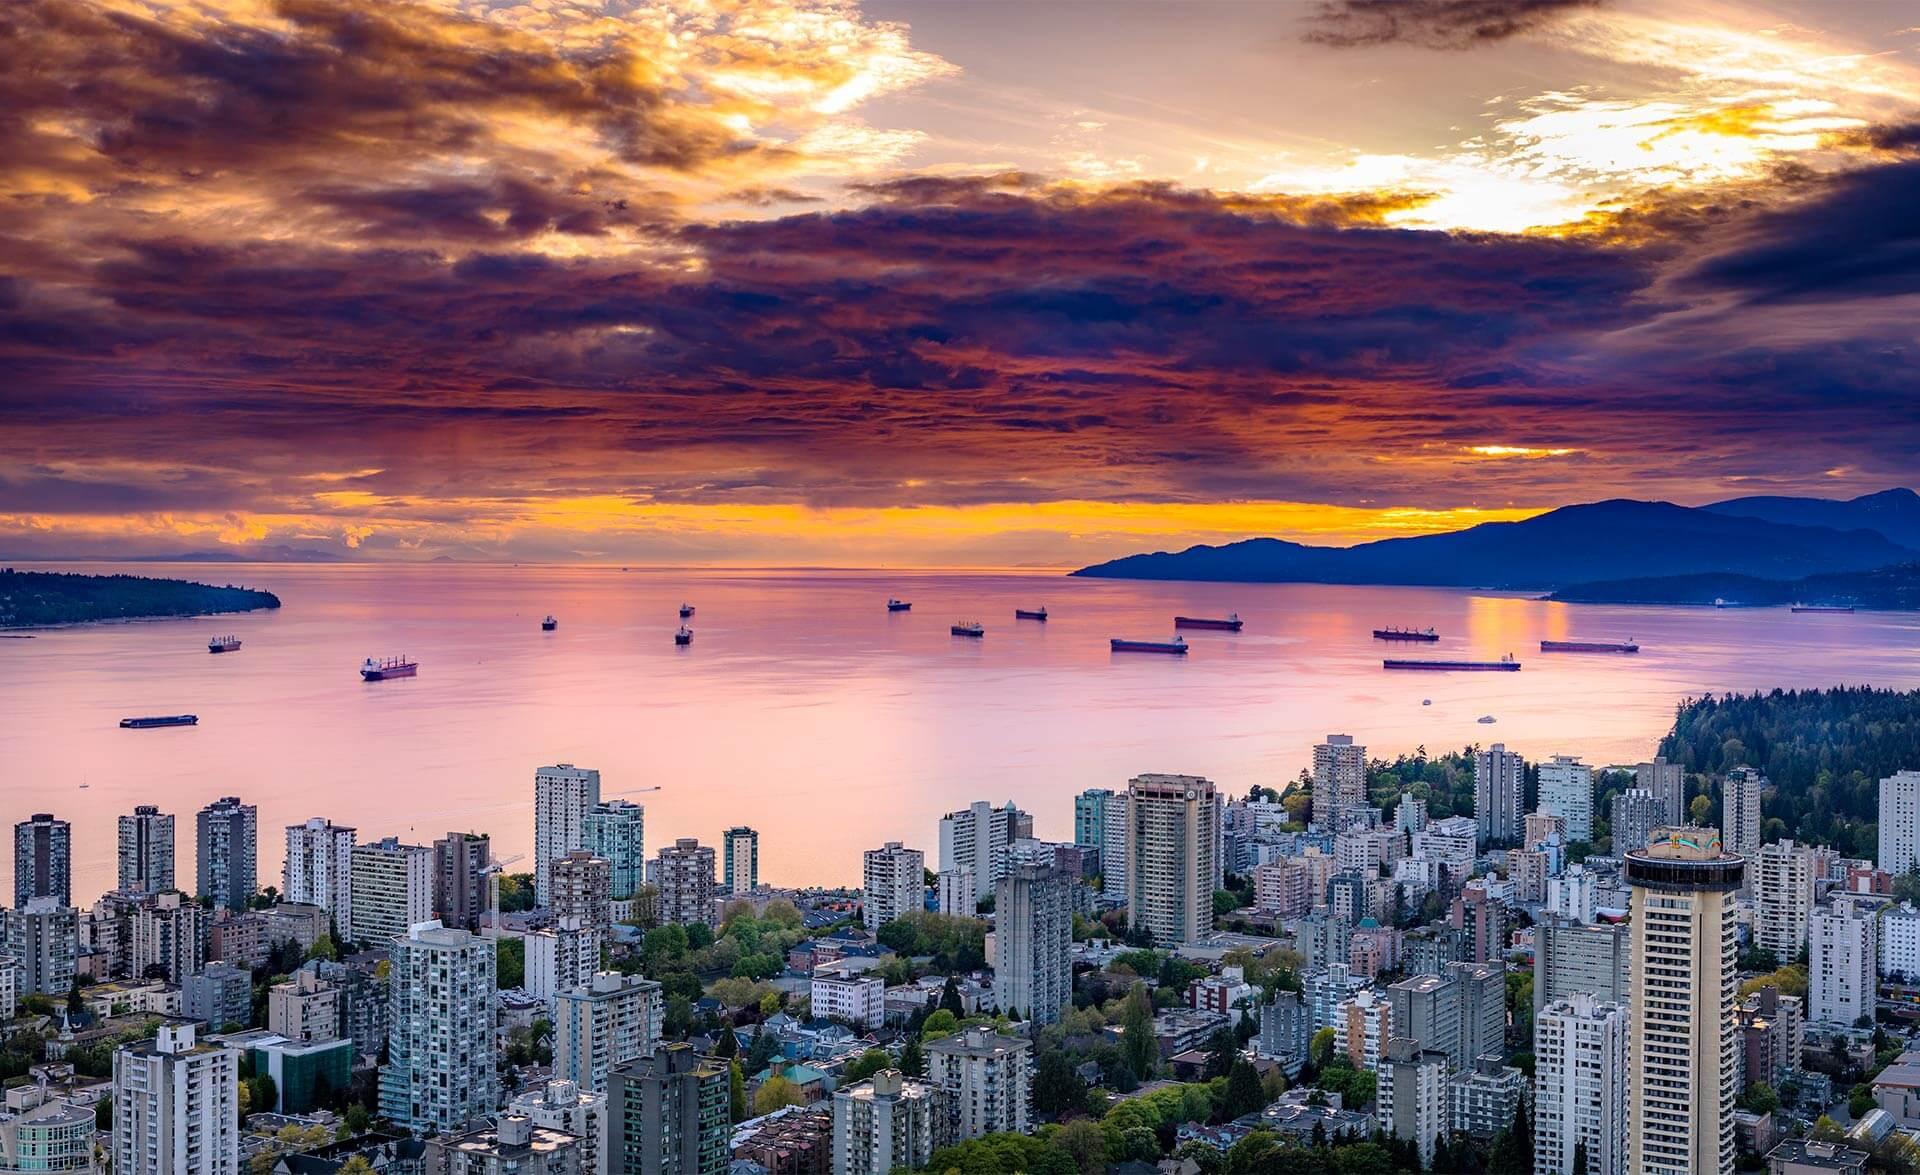 Harbor of English Bay, Vancouver, Canada (Photo Mike Benna, Unsplash)